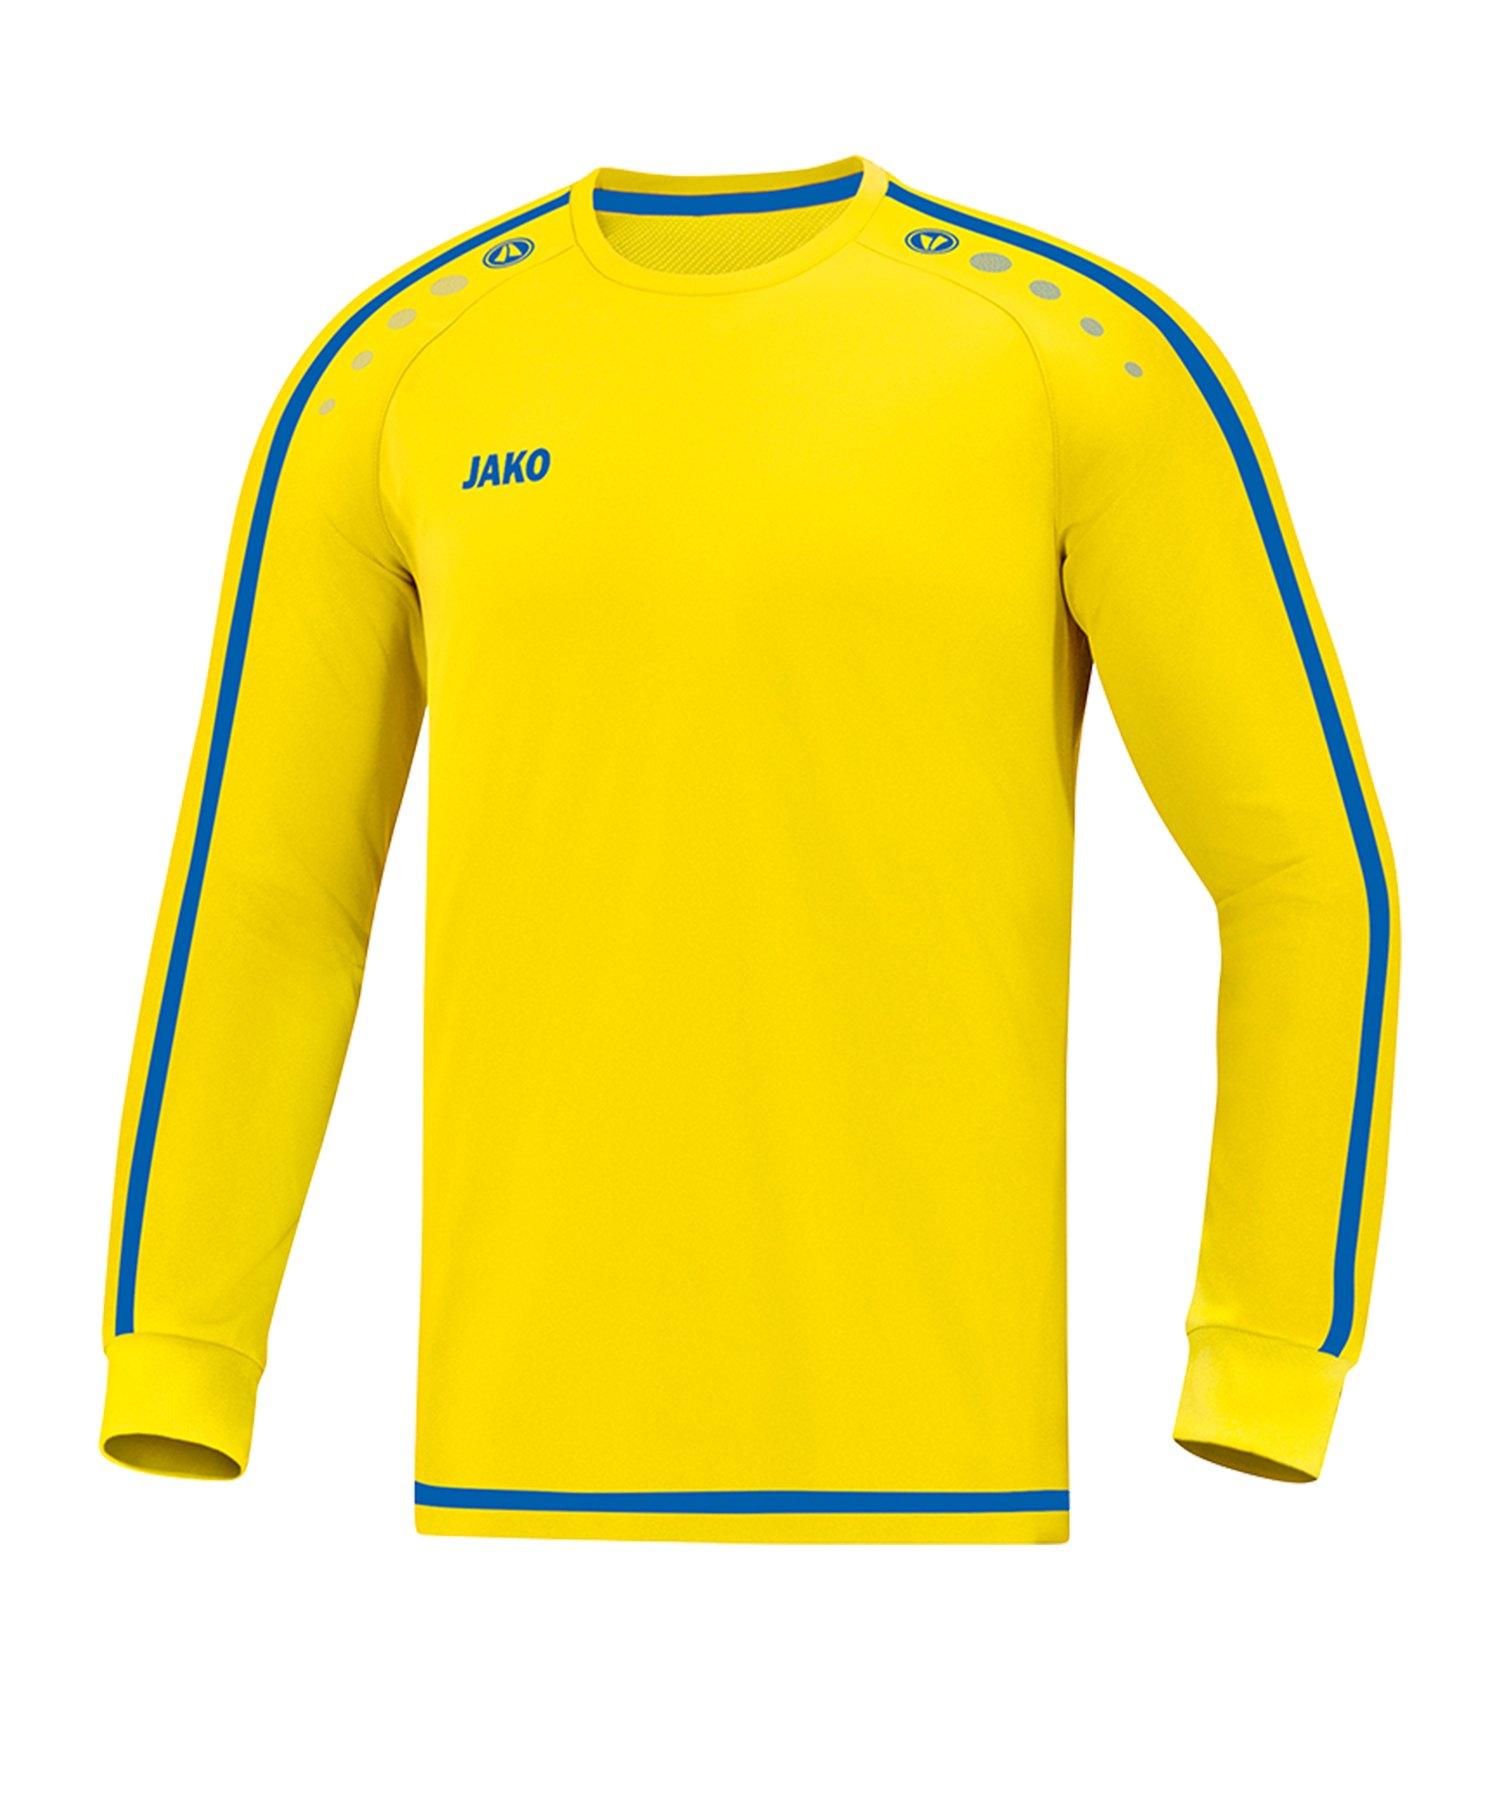 Jako Striker 2.0 Trikot langarm Kids Gelb Blau F12 - Gelb